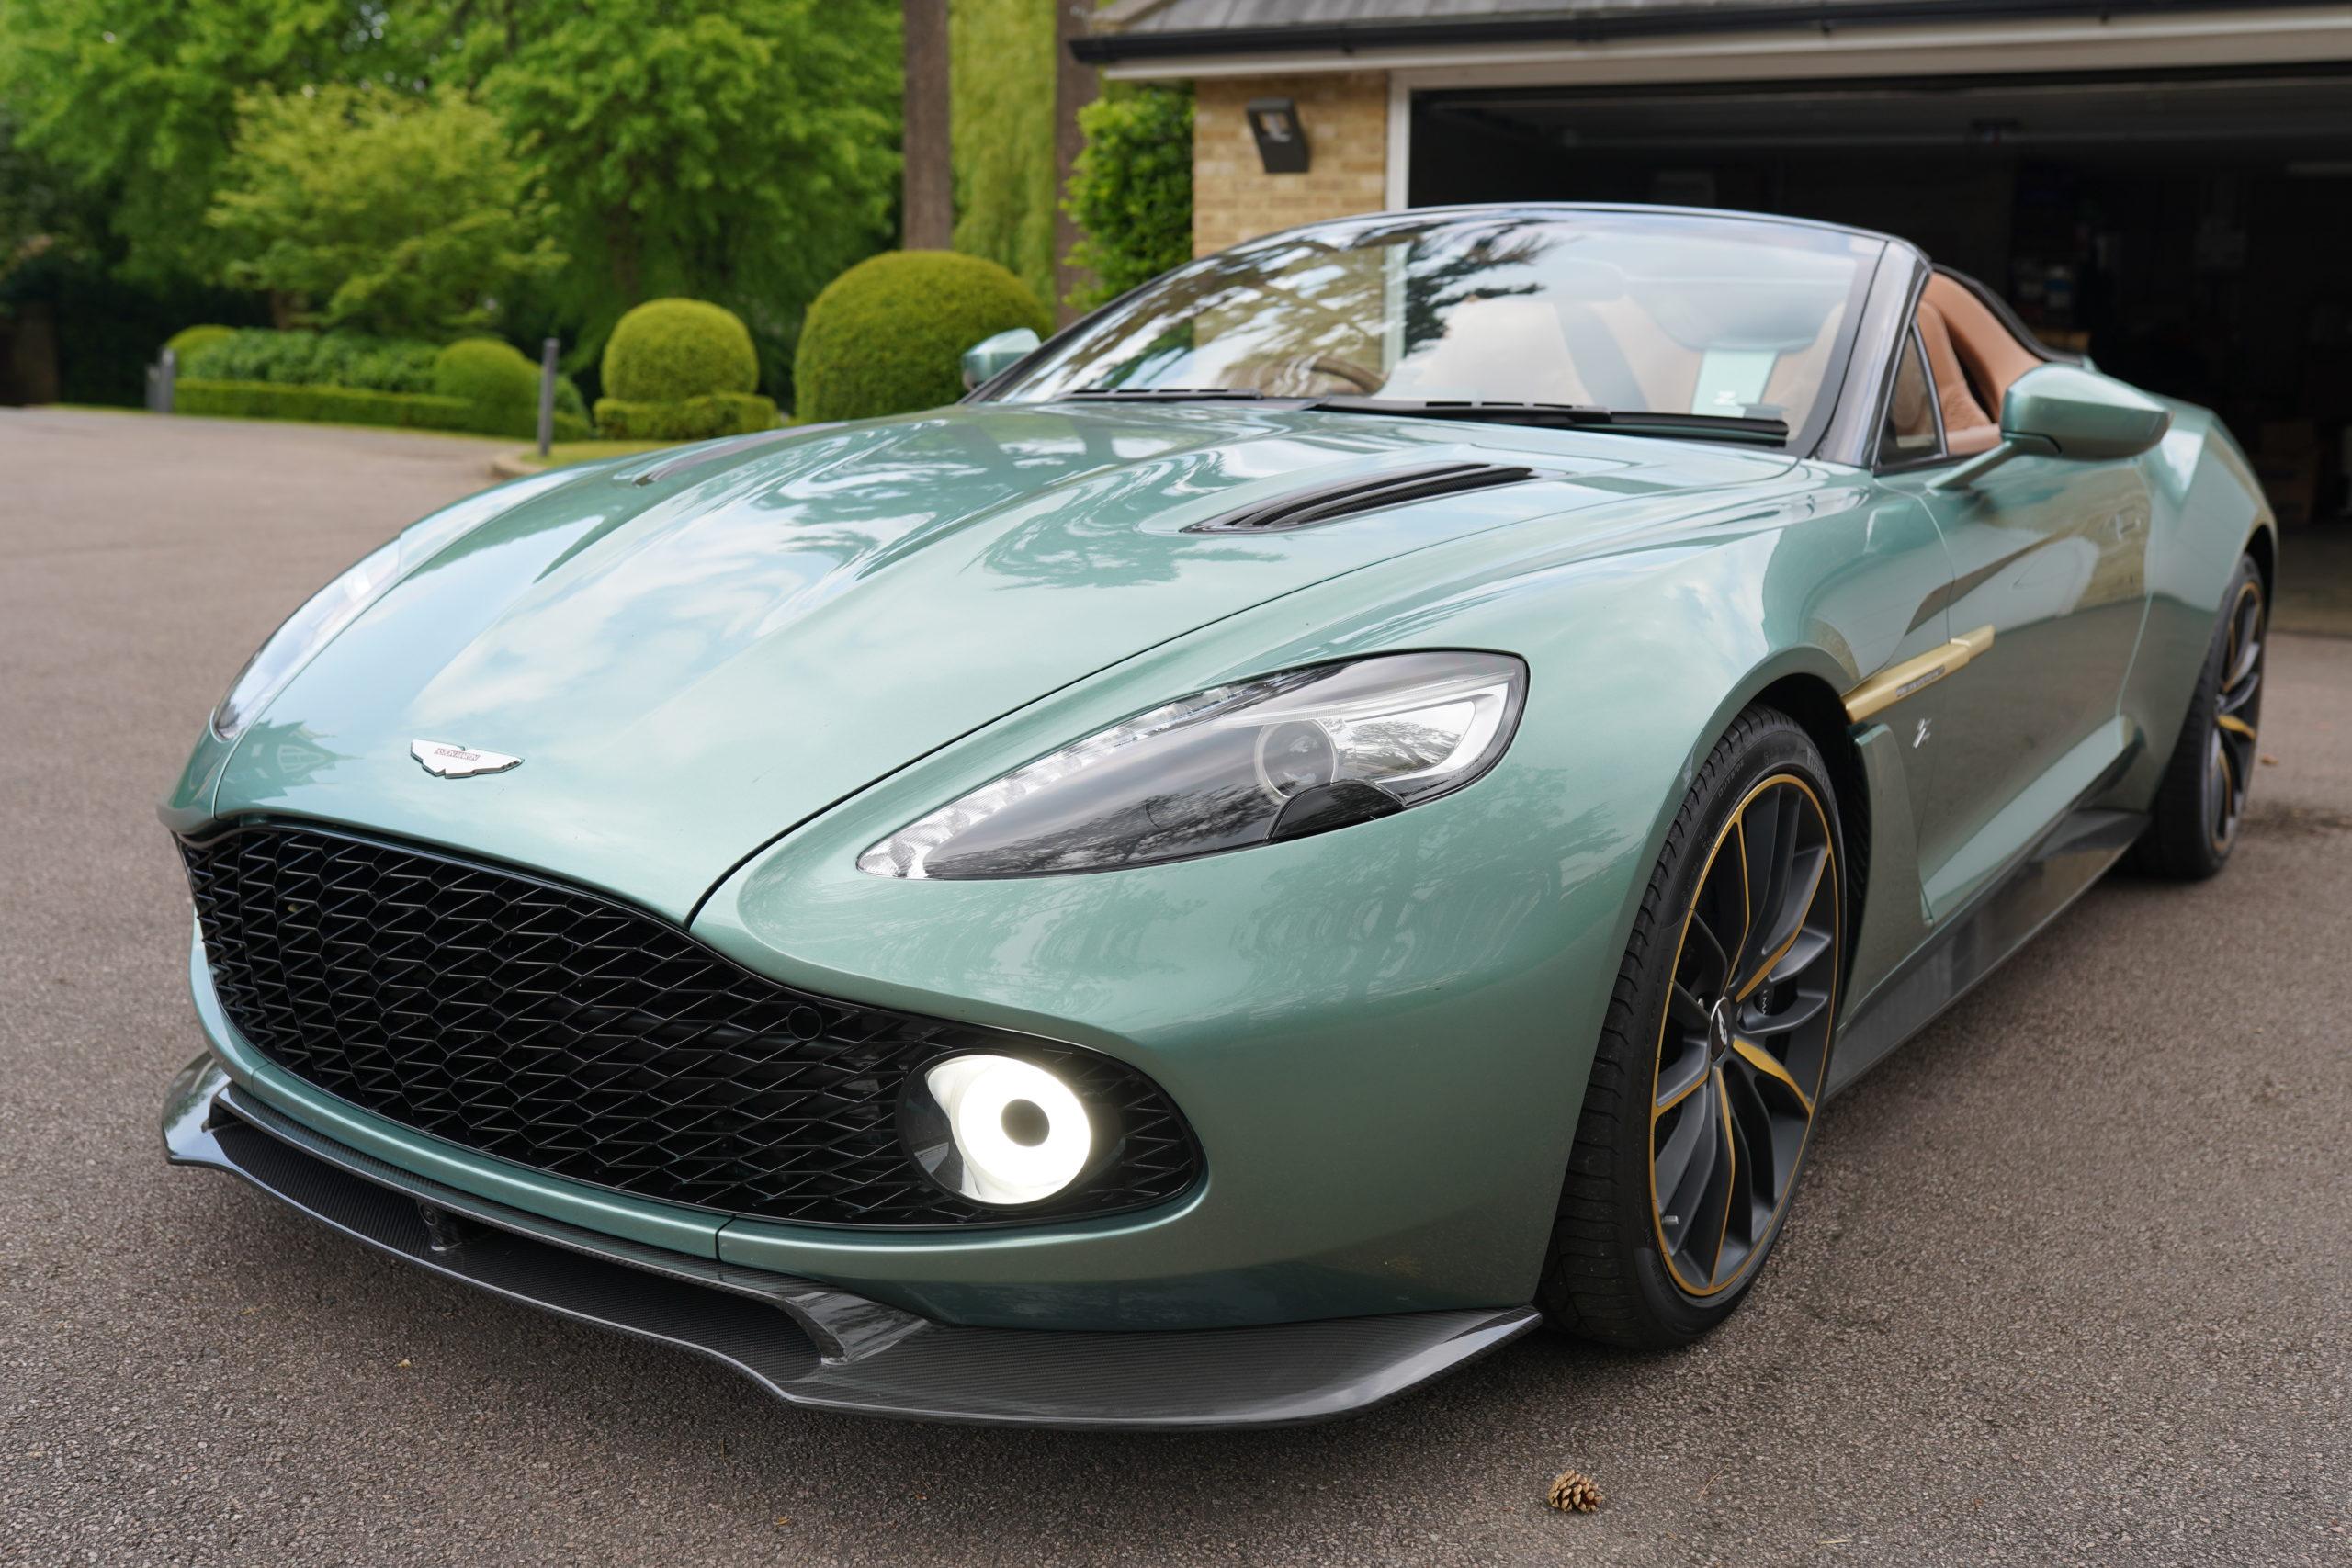 Super Rare Aston Martin Vanquish Zagato Speedster Carr Watches